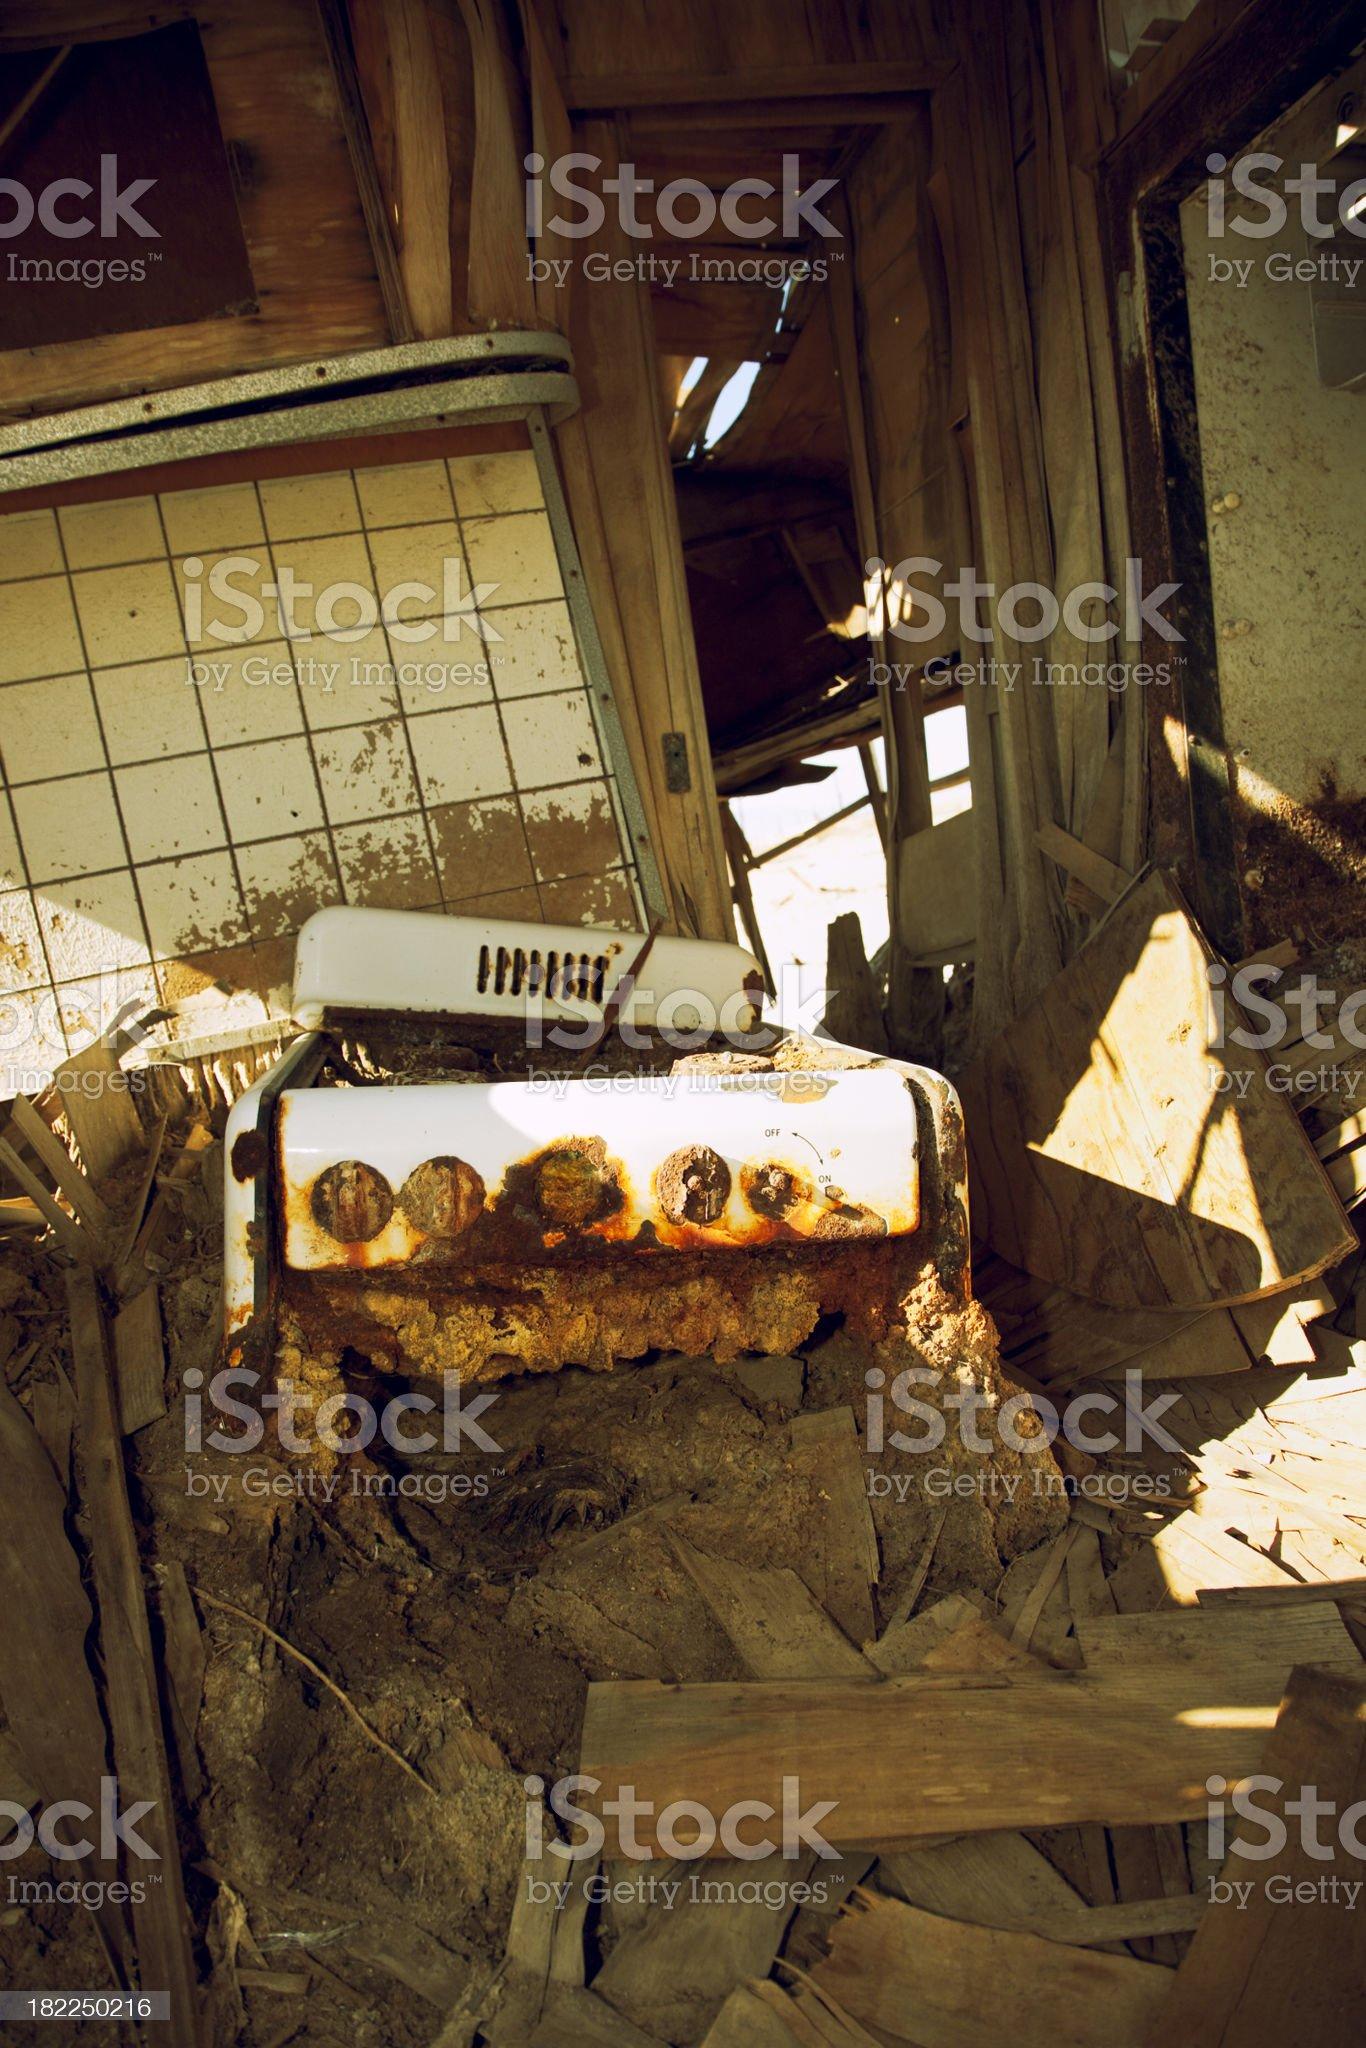 Abandoned Trailer on Salt Flats, Interior, Salton Sea, California, Grunge royalty-free stock photo